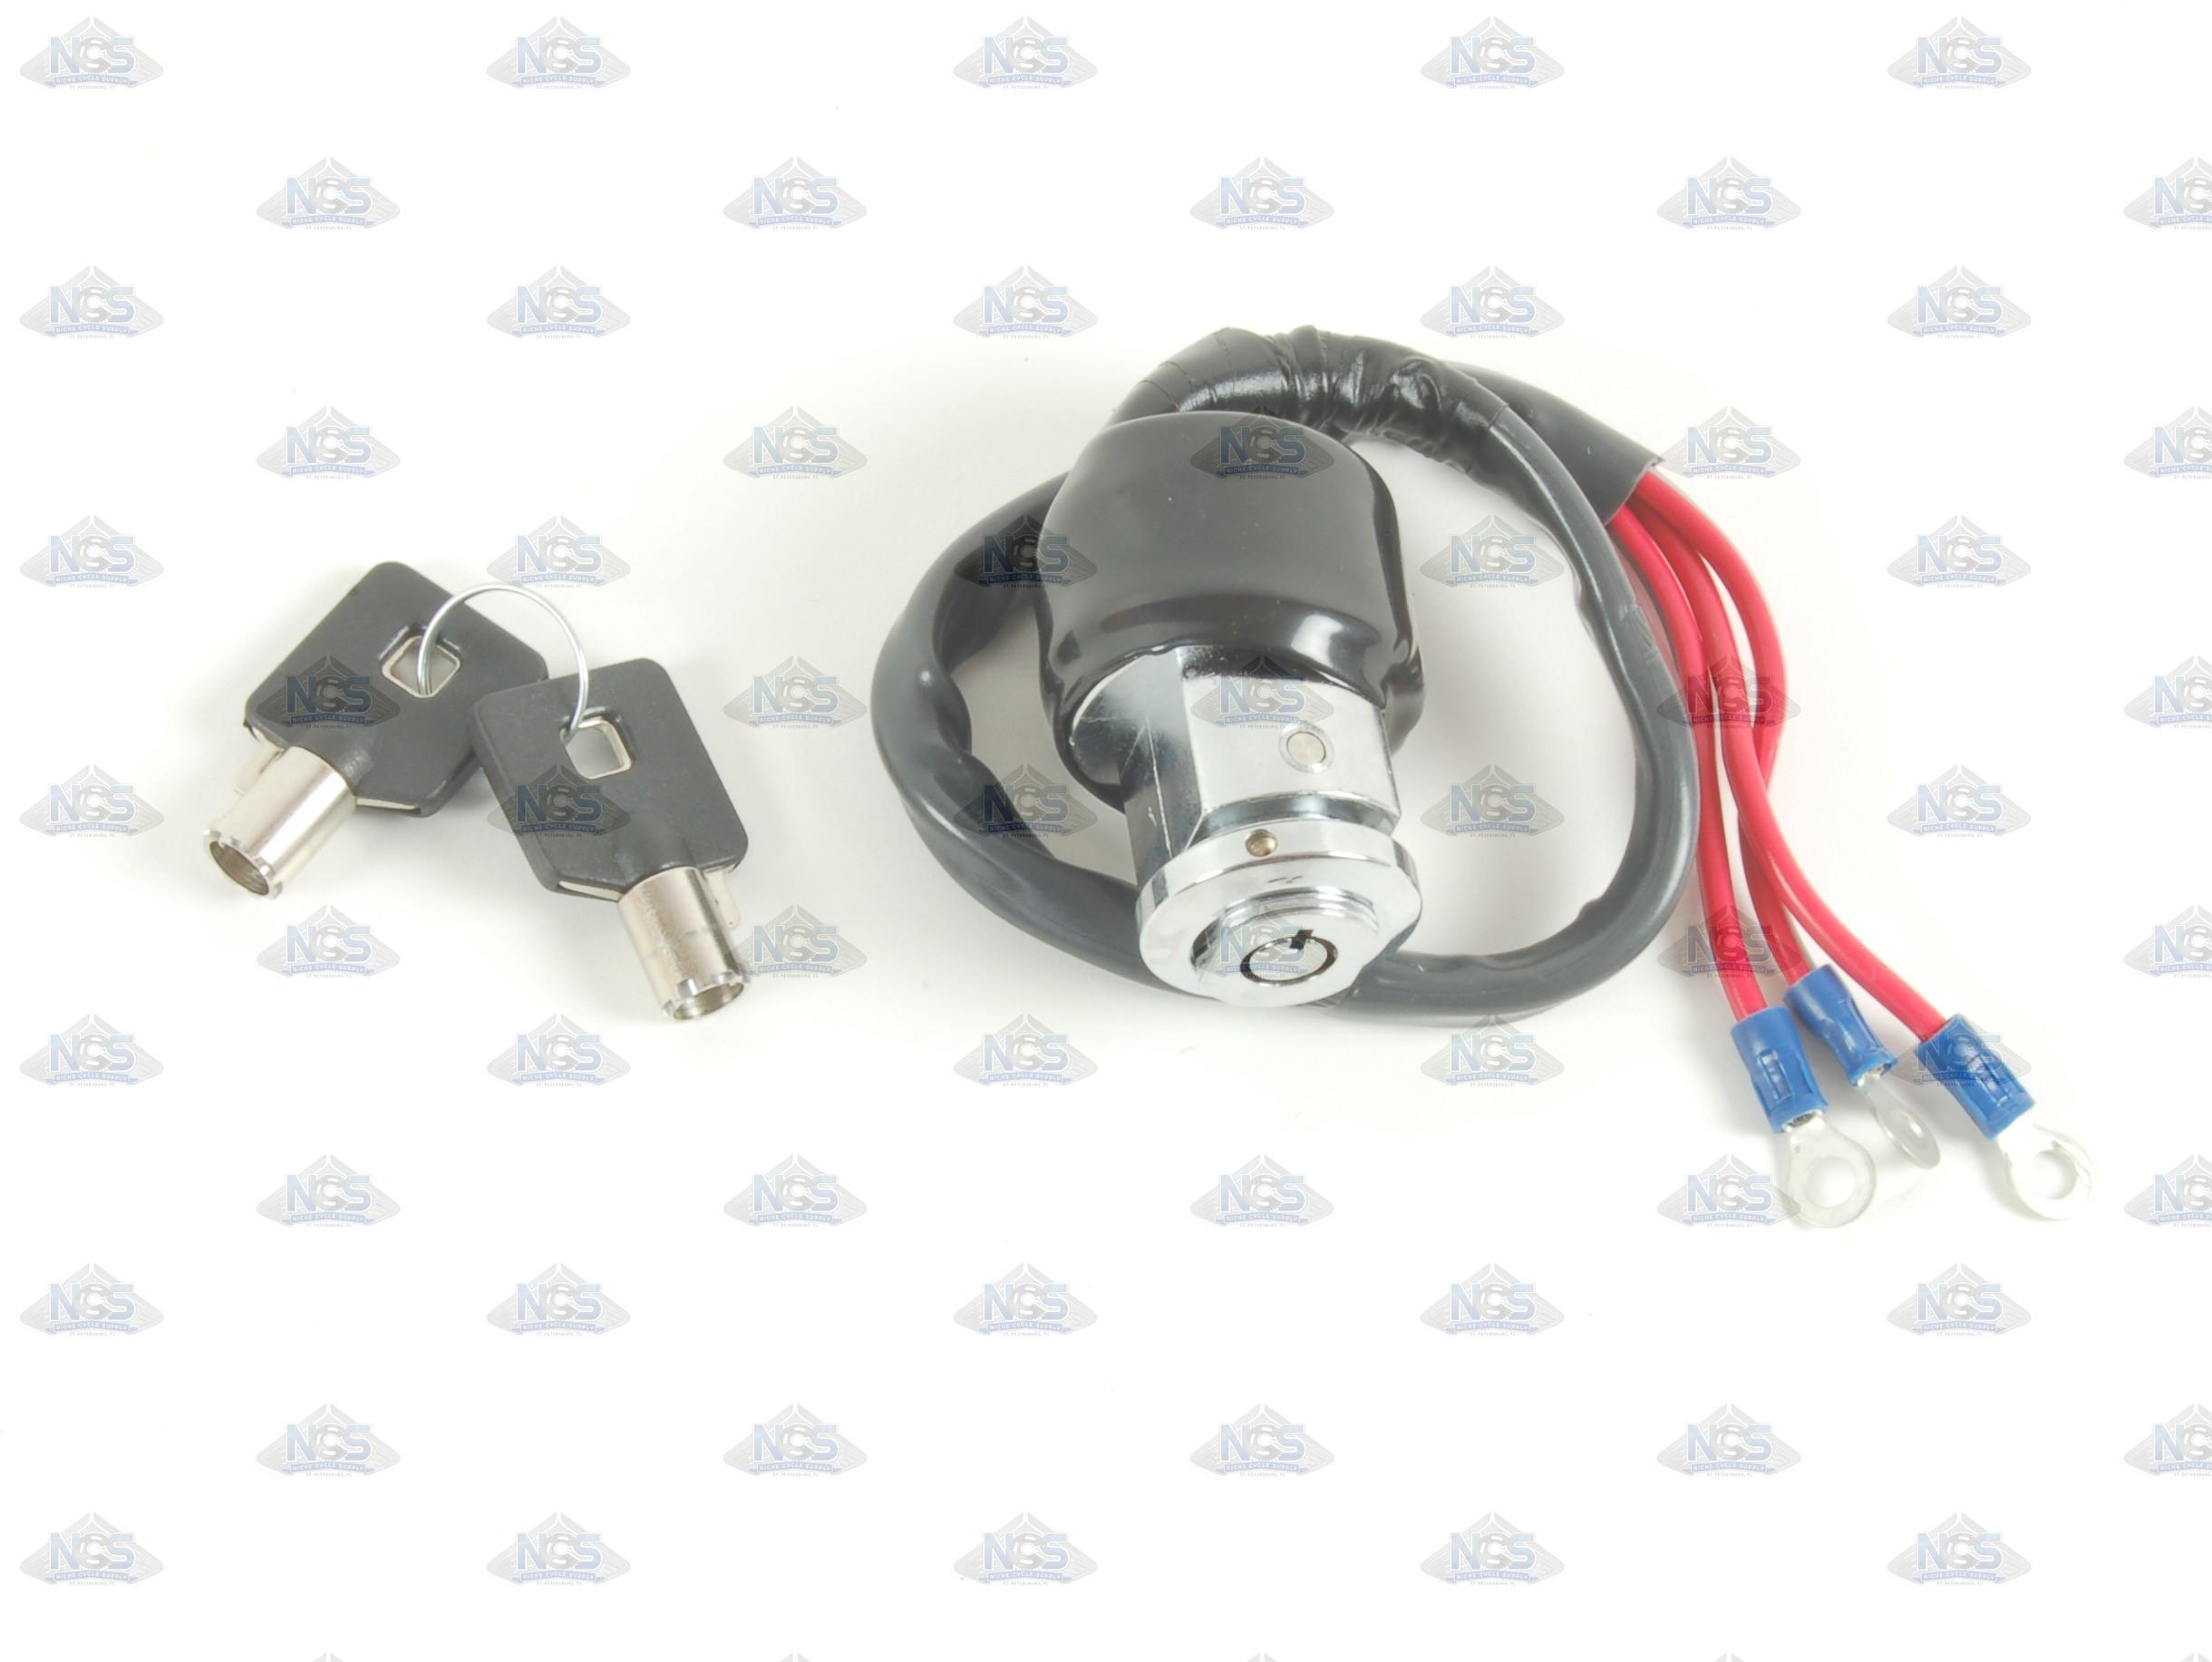 harley davidson ignition key number alarm circuit diagram style xl fx round switch